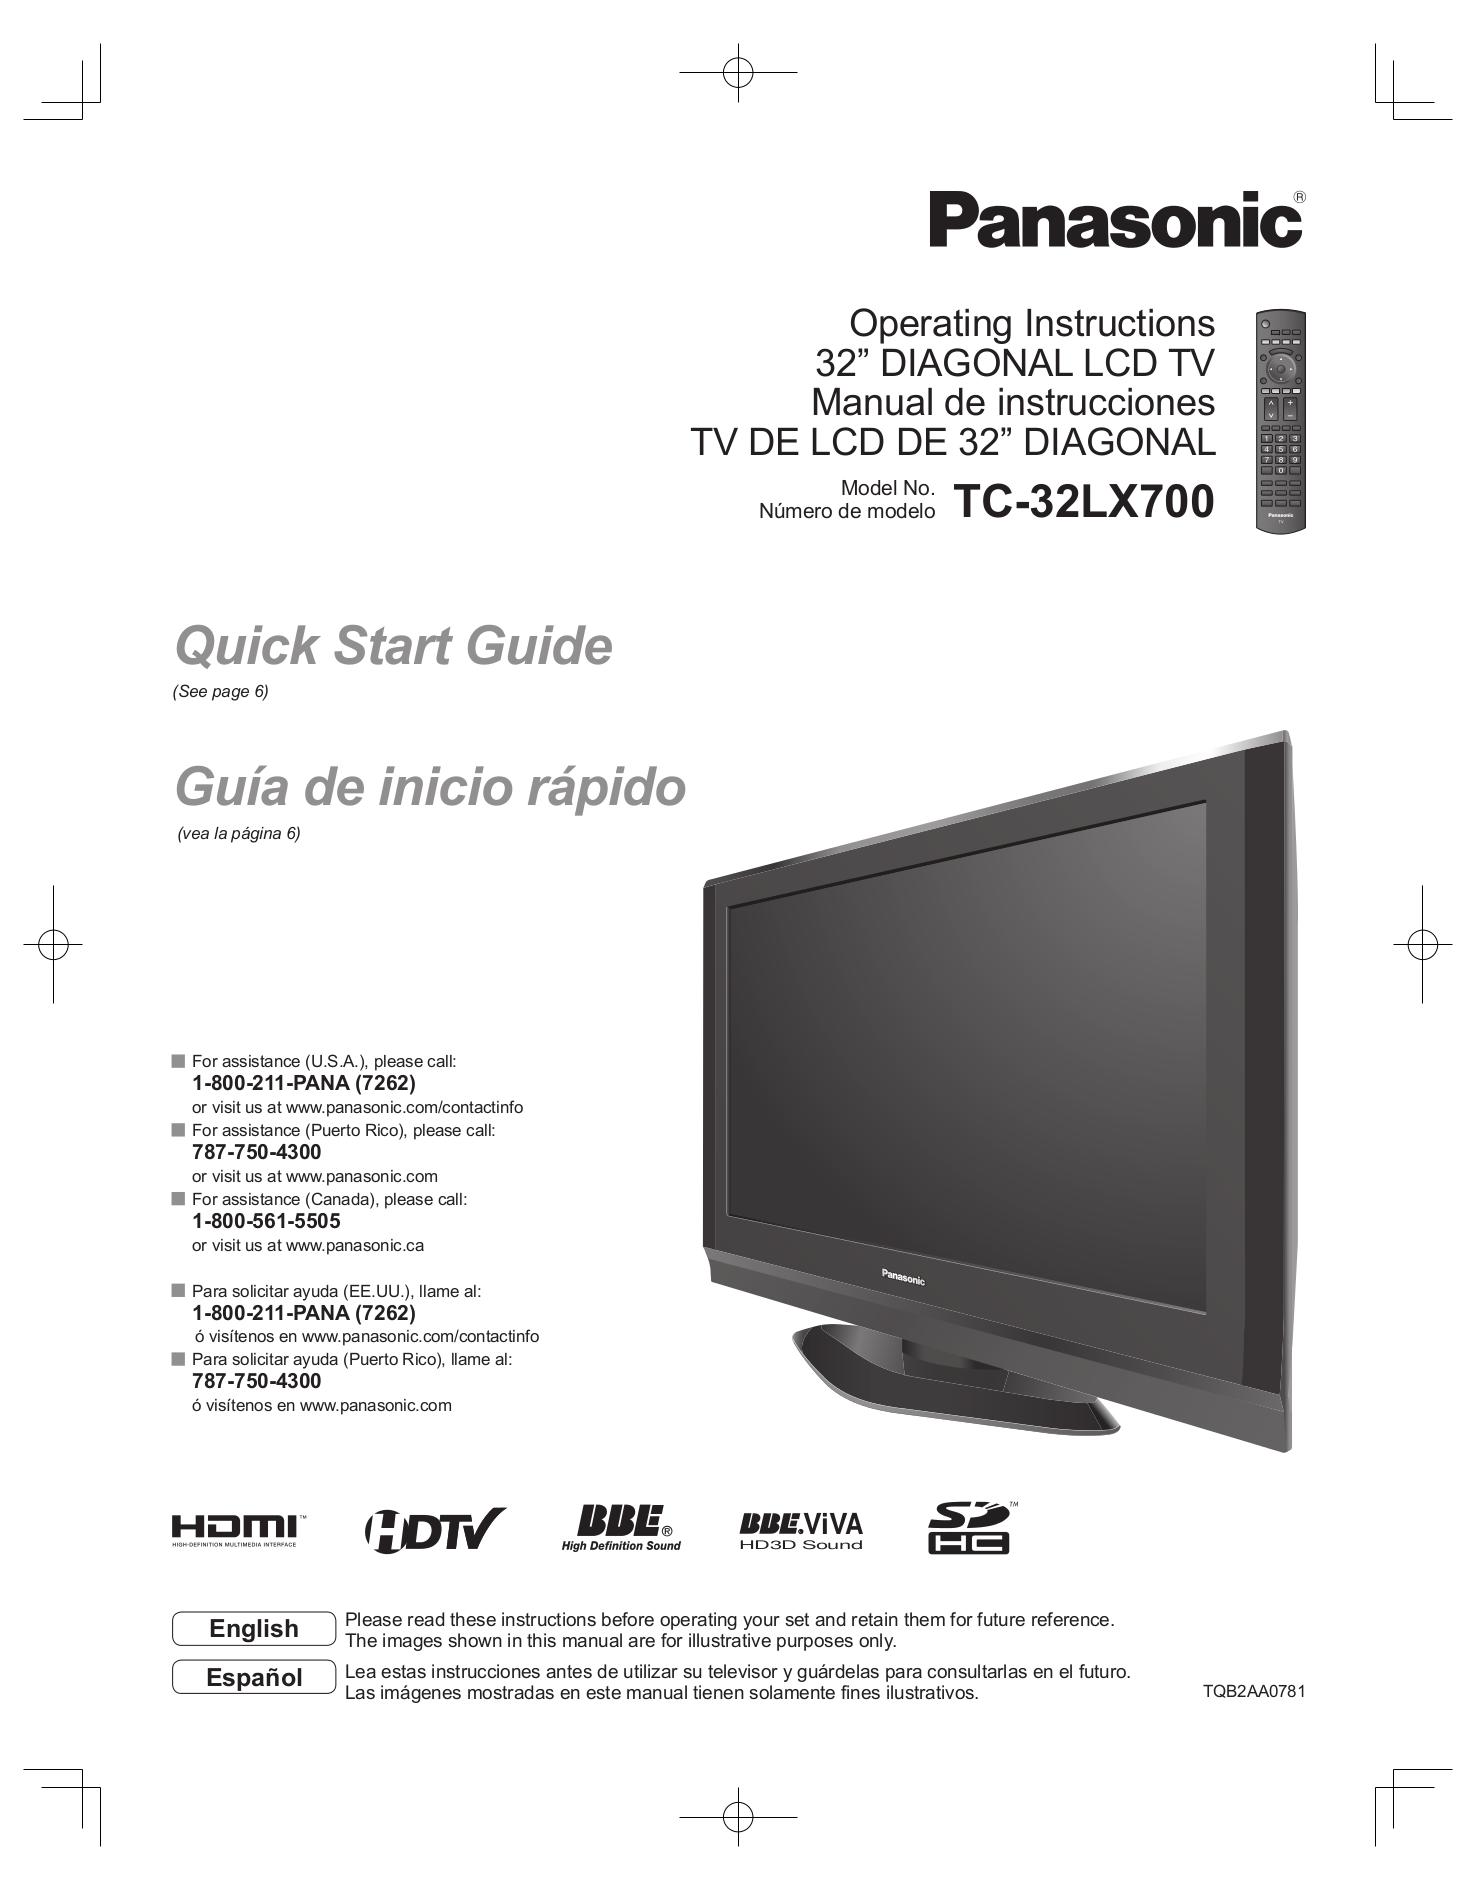 panasonic viera owners operating manual user guide manual that rh sibere co panasonic plasma tv user manual panasonic plasma tv user manual